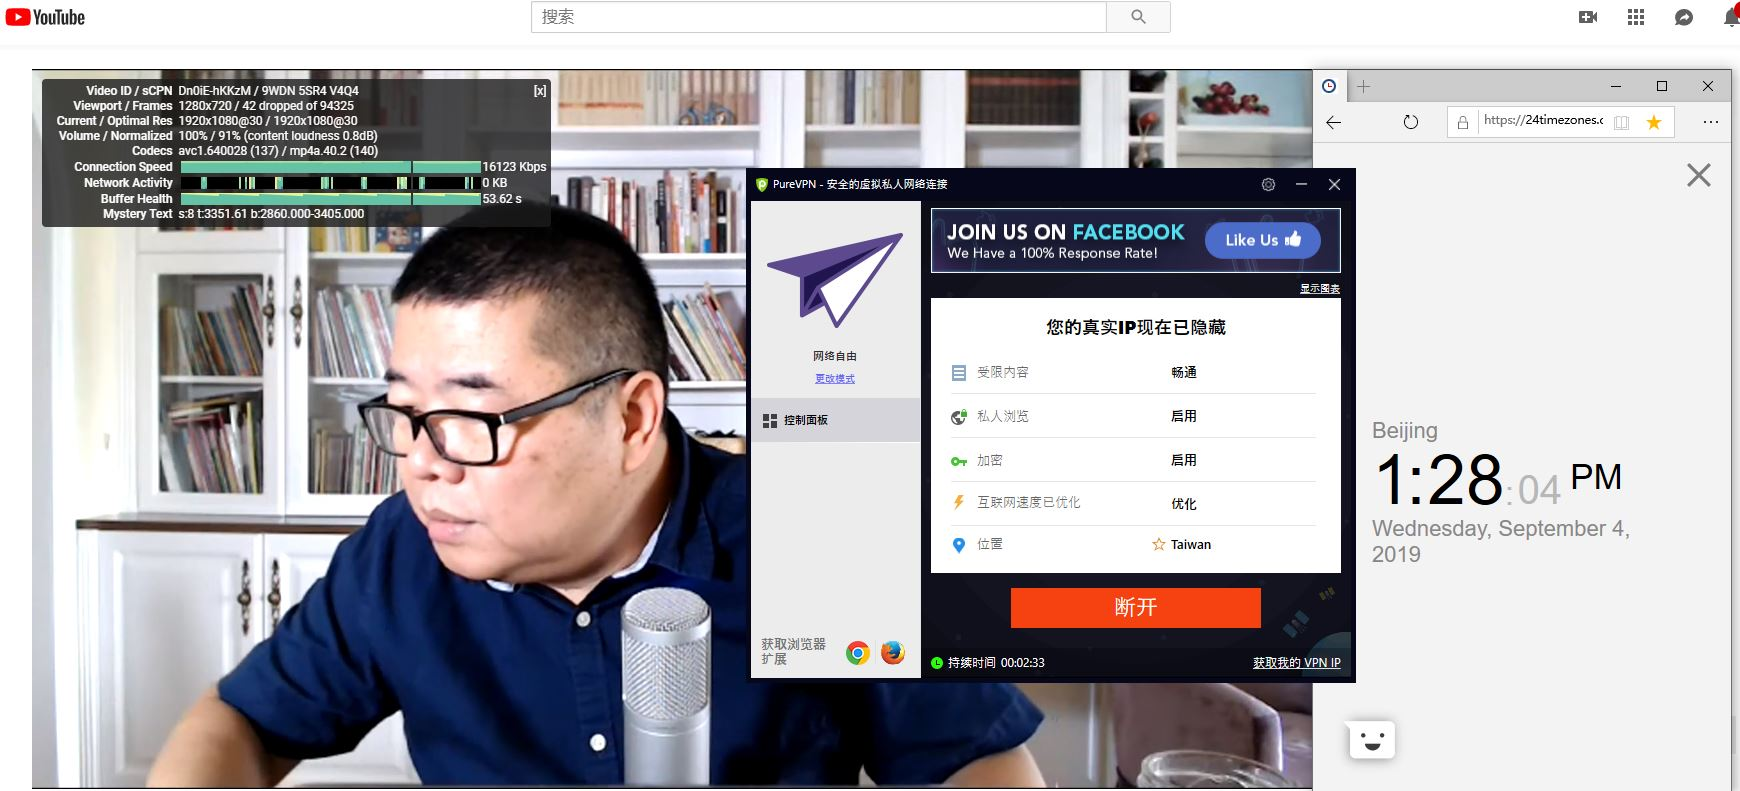 windows Purevpn Taiwan 中国翻墙 科学上网 YouTube测试-20190904